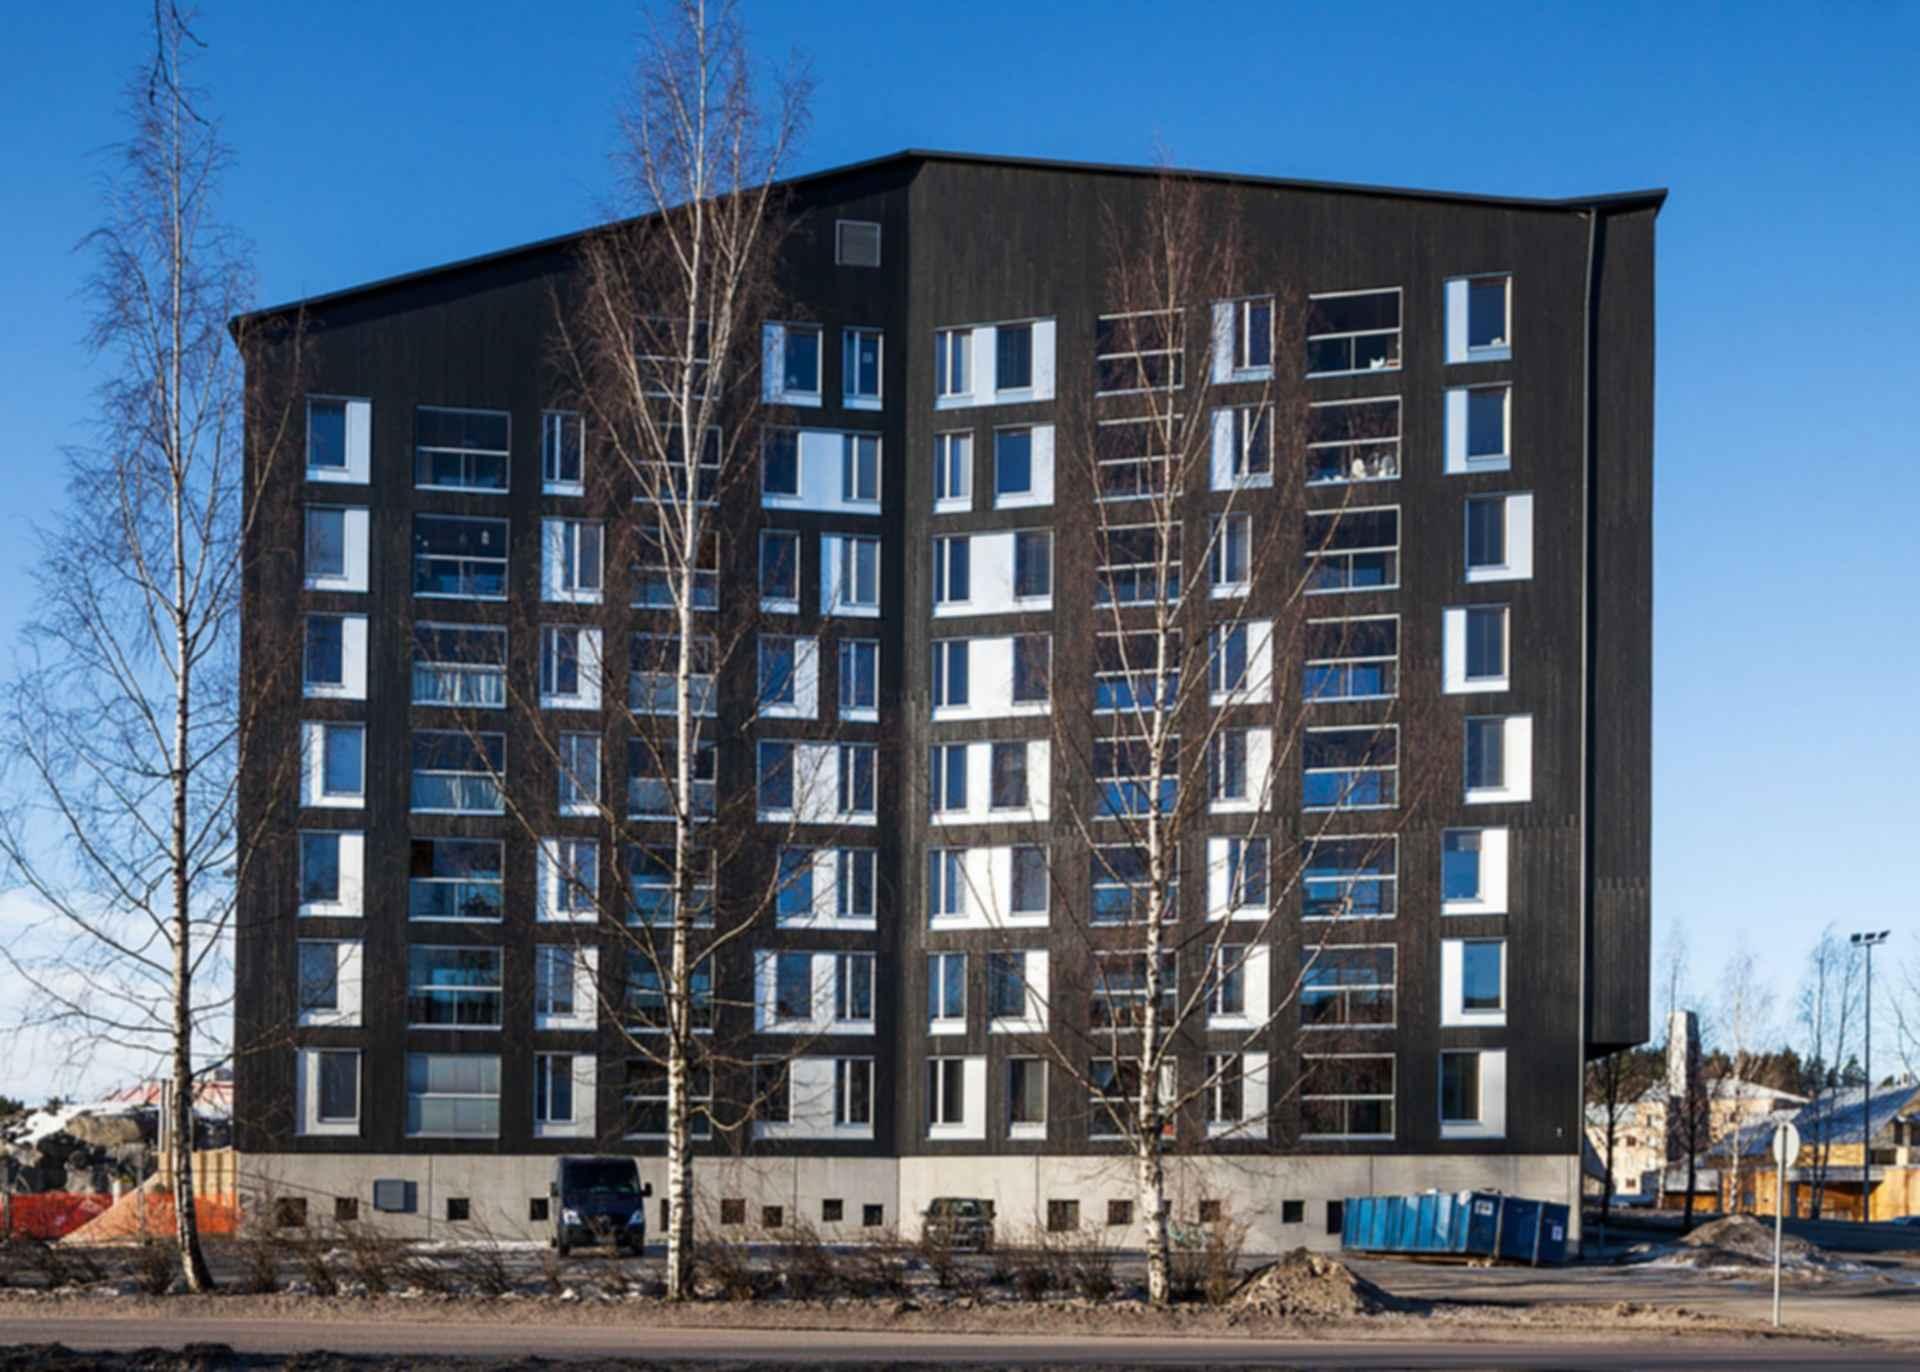 Puukuokka Housing Block - Exterior/Parking